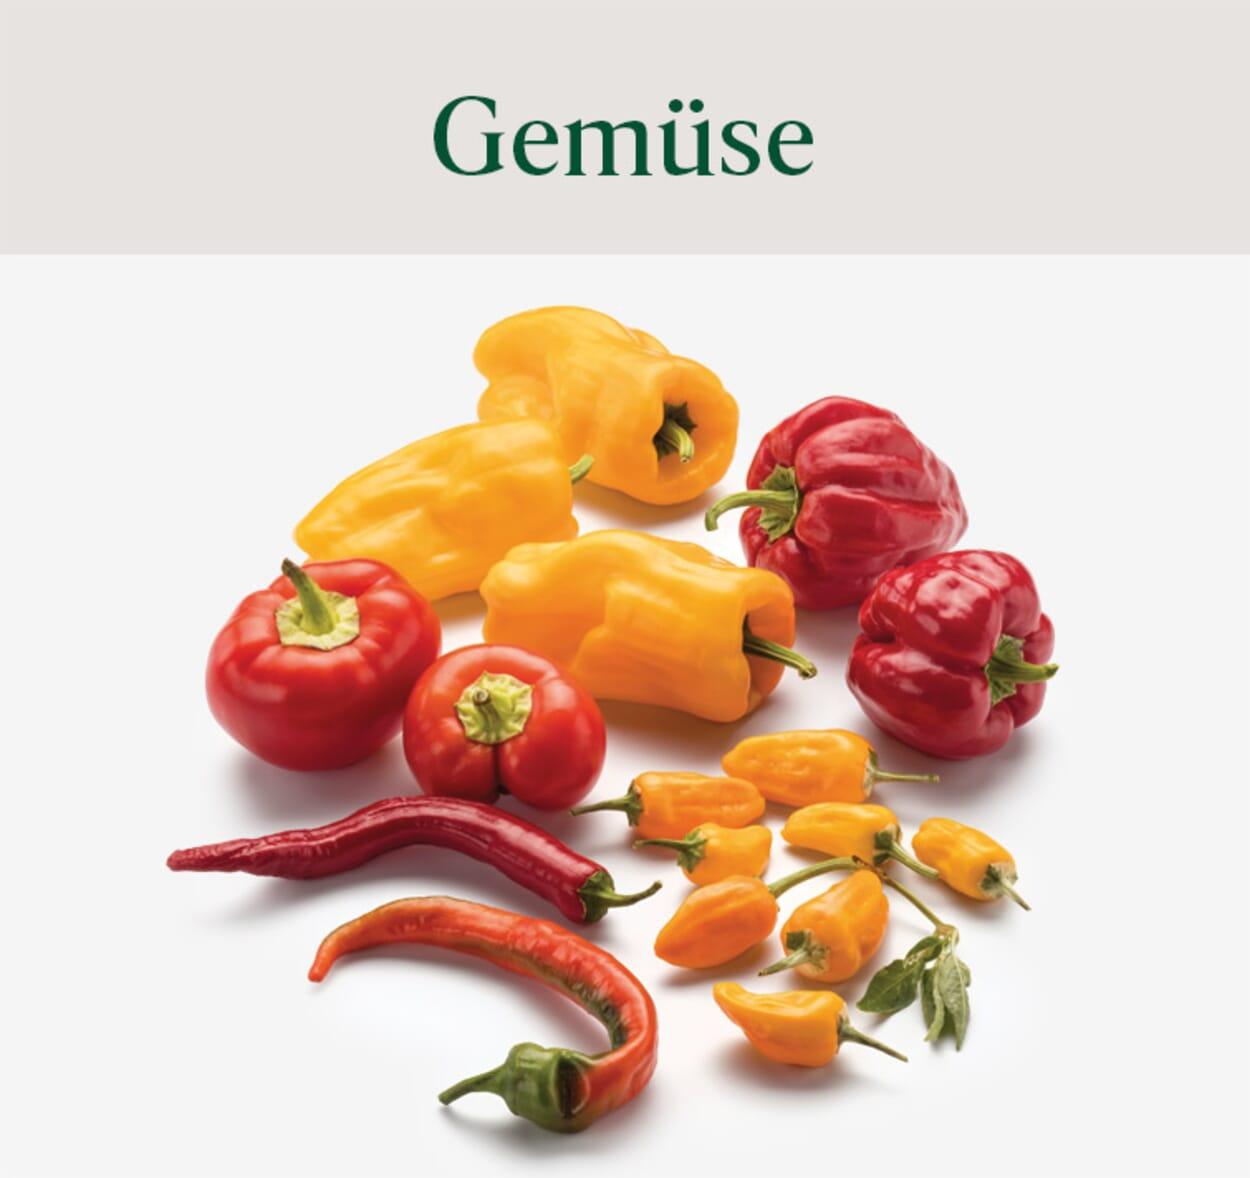 Gemüsesämereien & Gemüsepflanzen